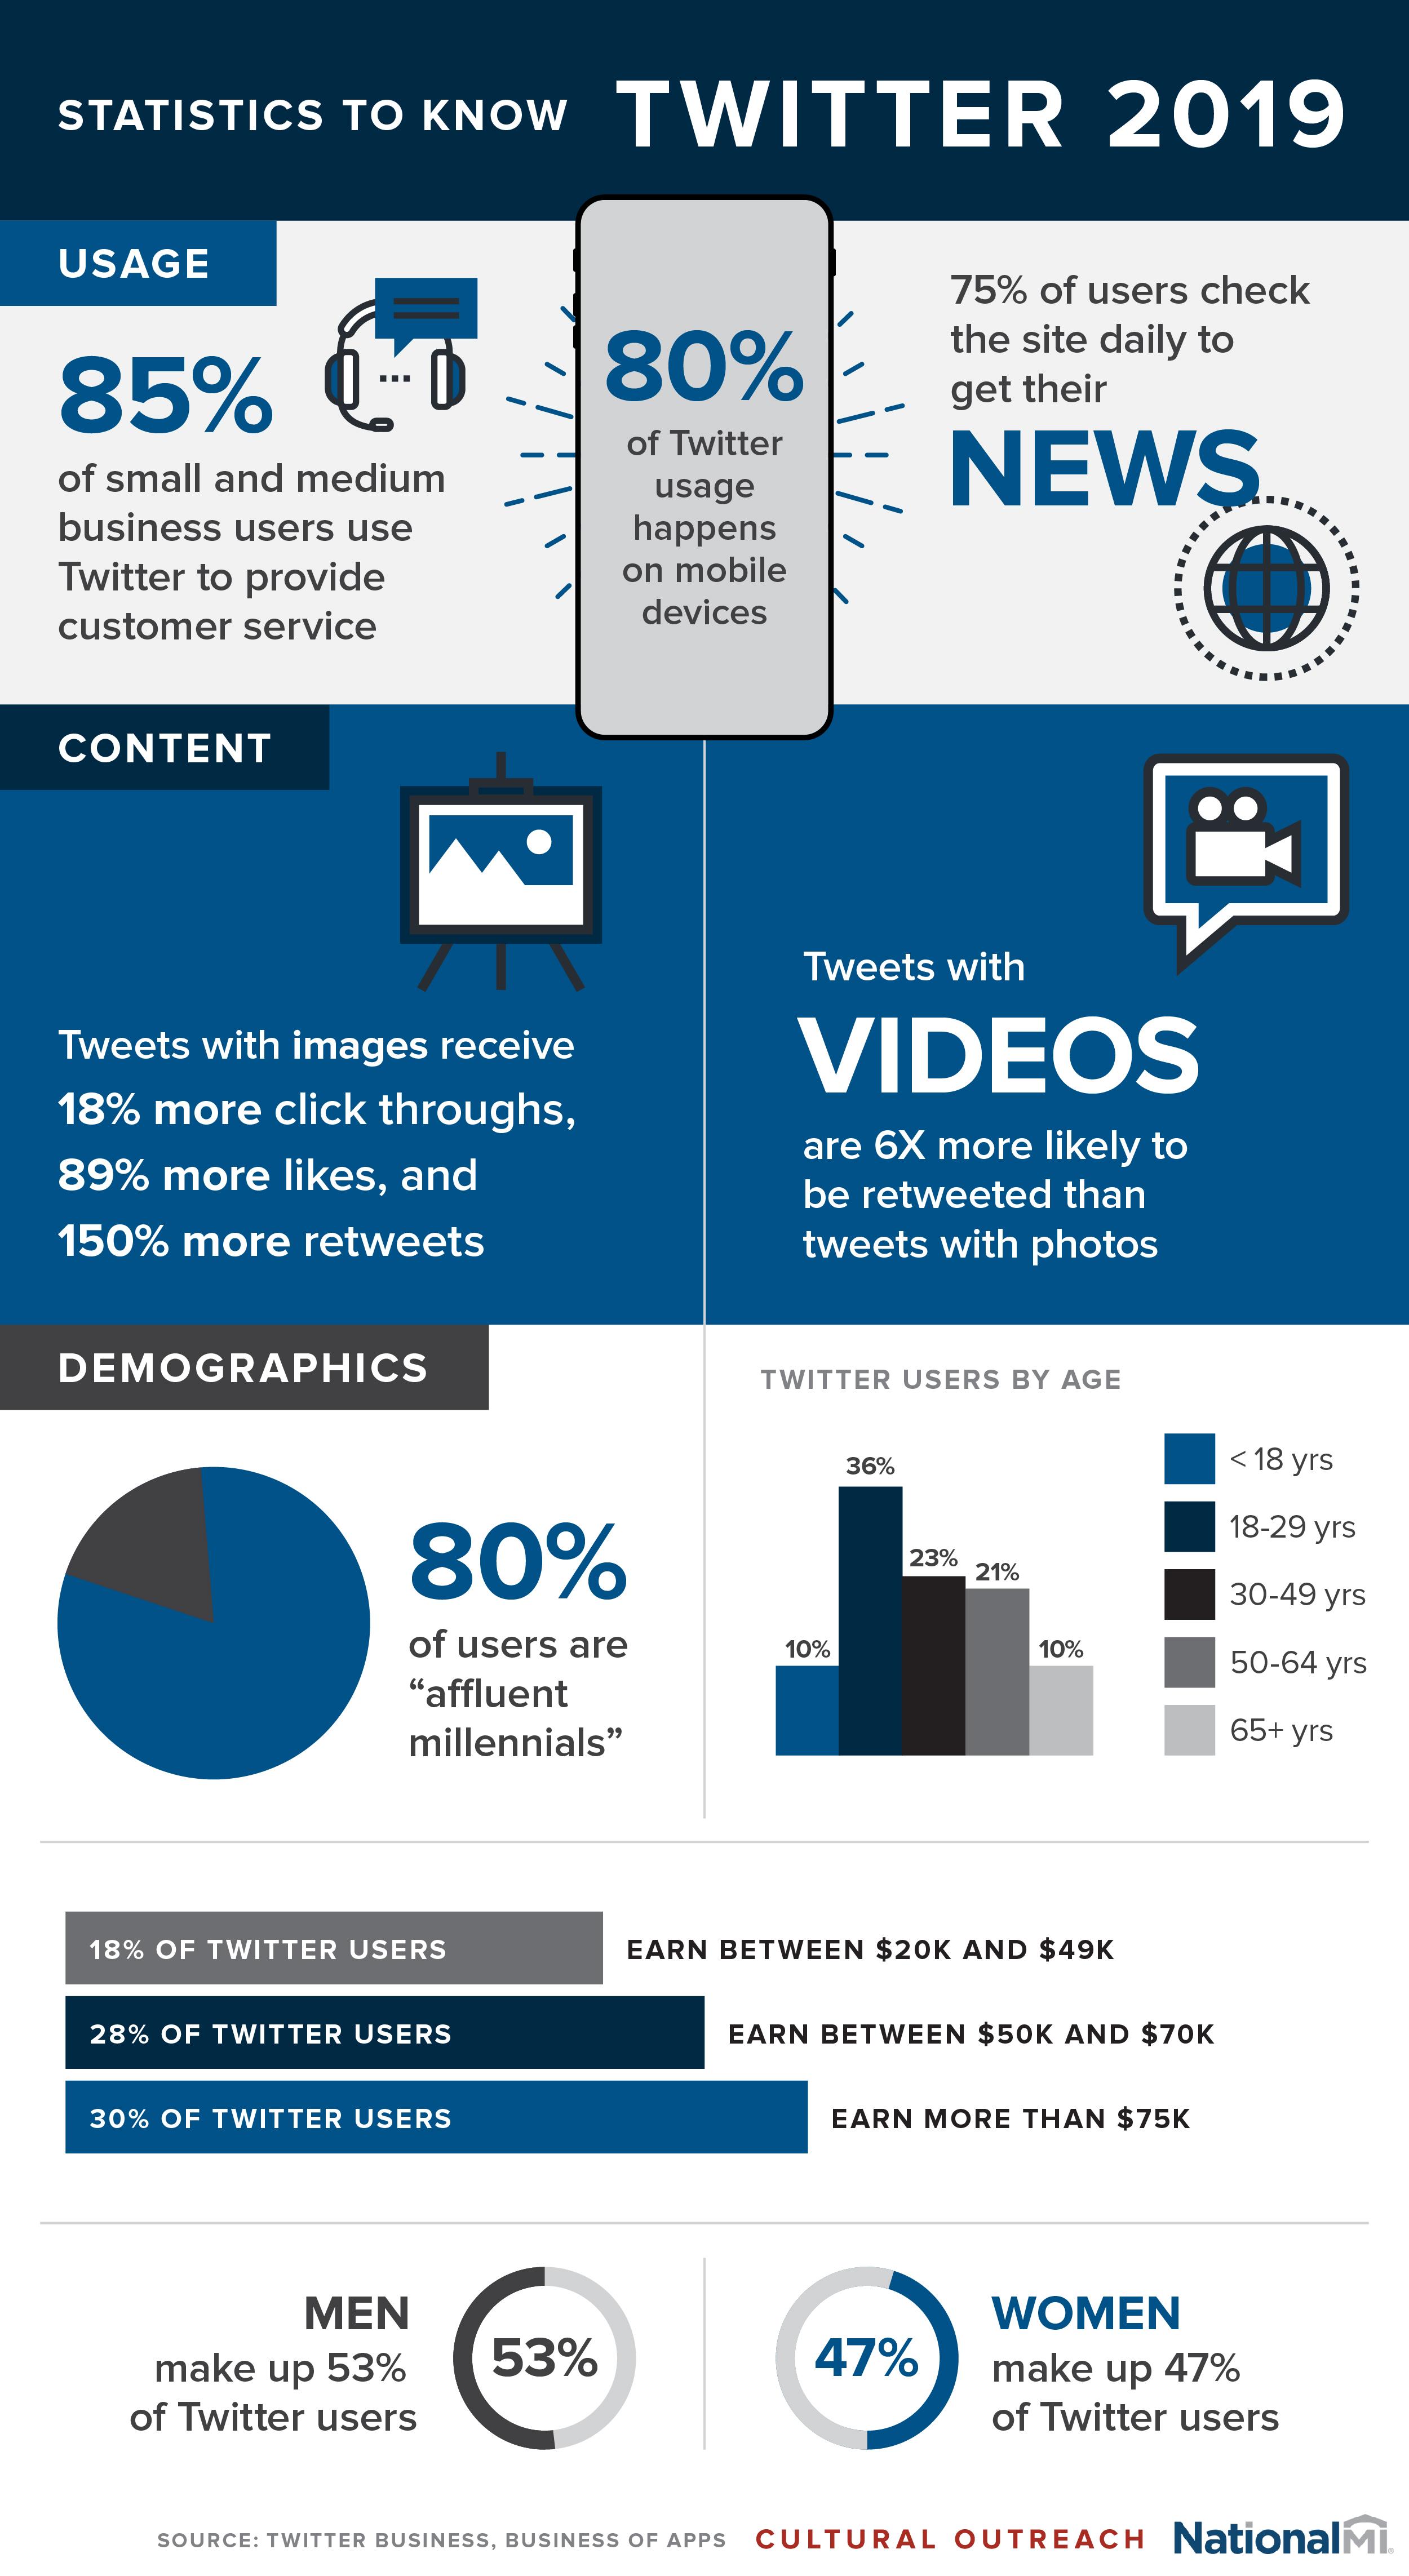 COS183_Twitter2019_Infographic_R2V1_02-13-19_NMIBlue-01.jpg